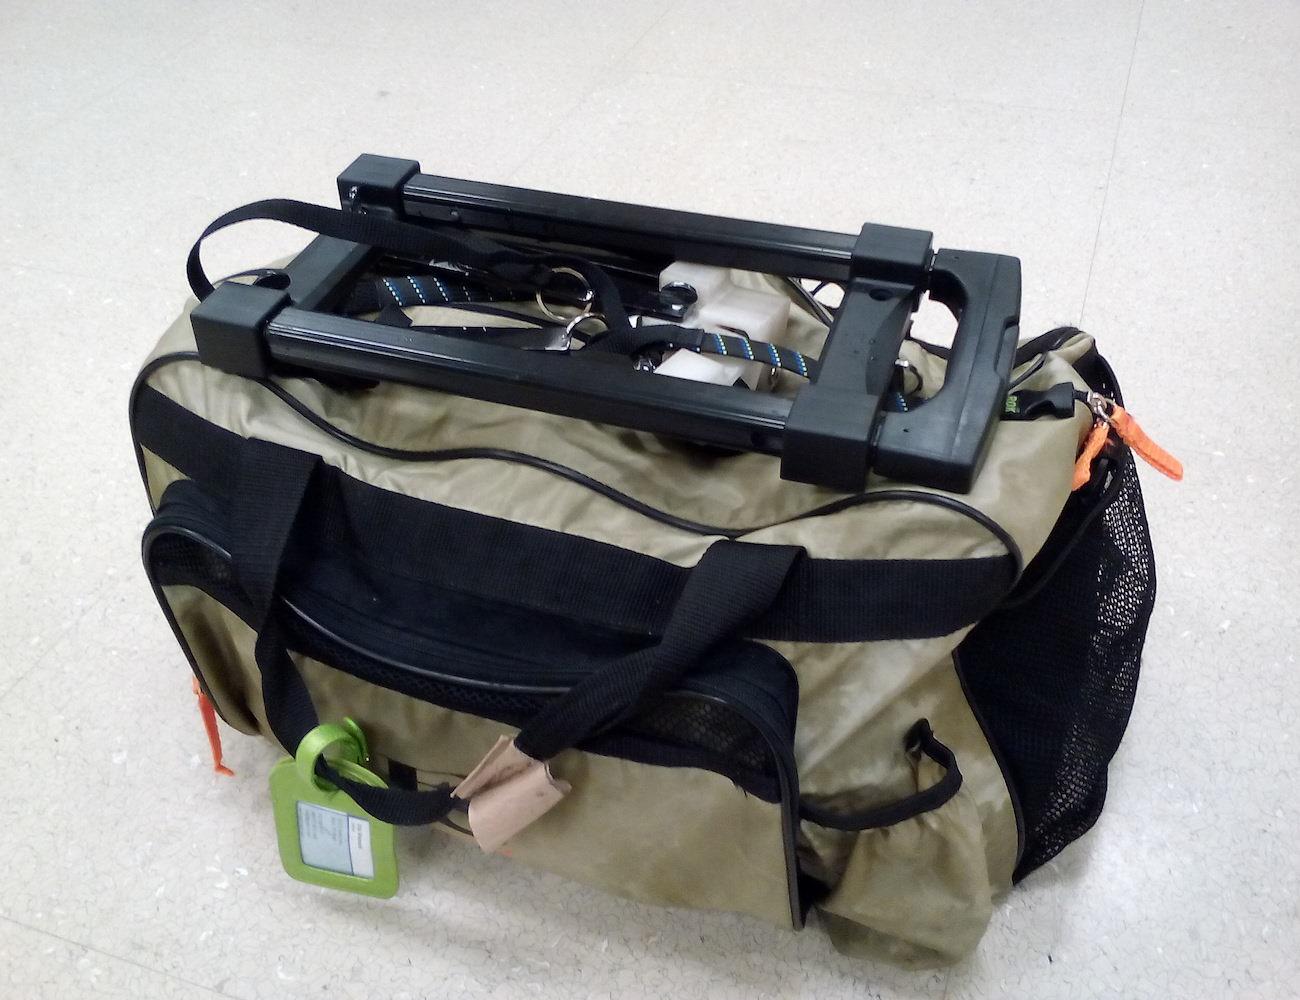 KwikT – Compat Mini Trolley For Smart Travelers